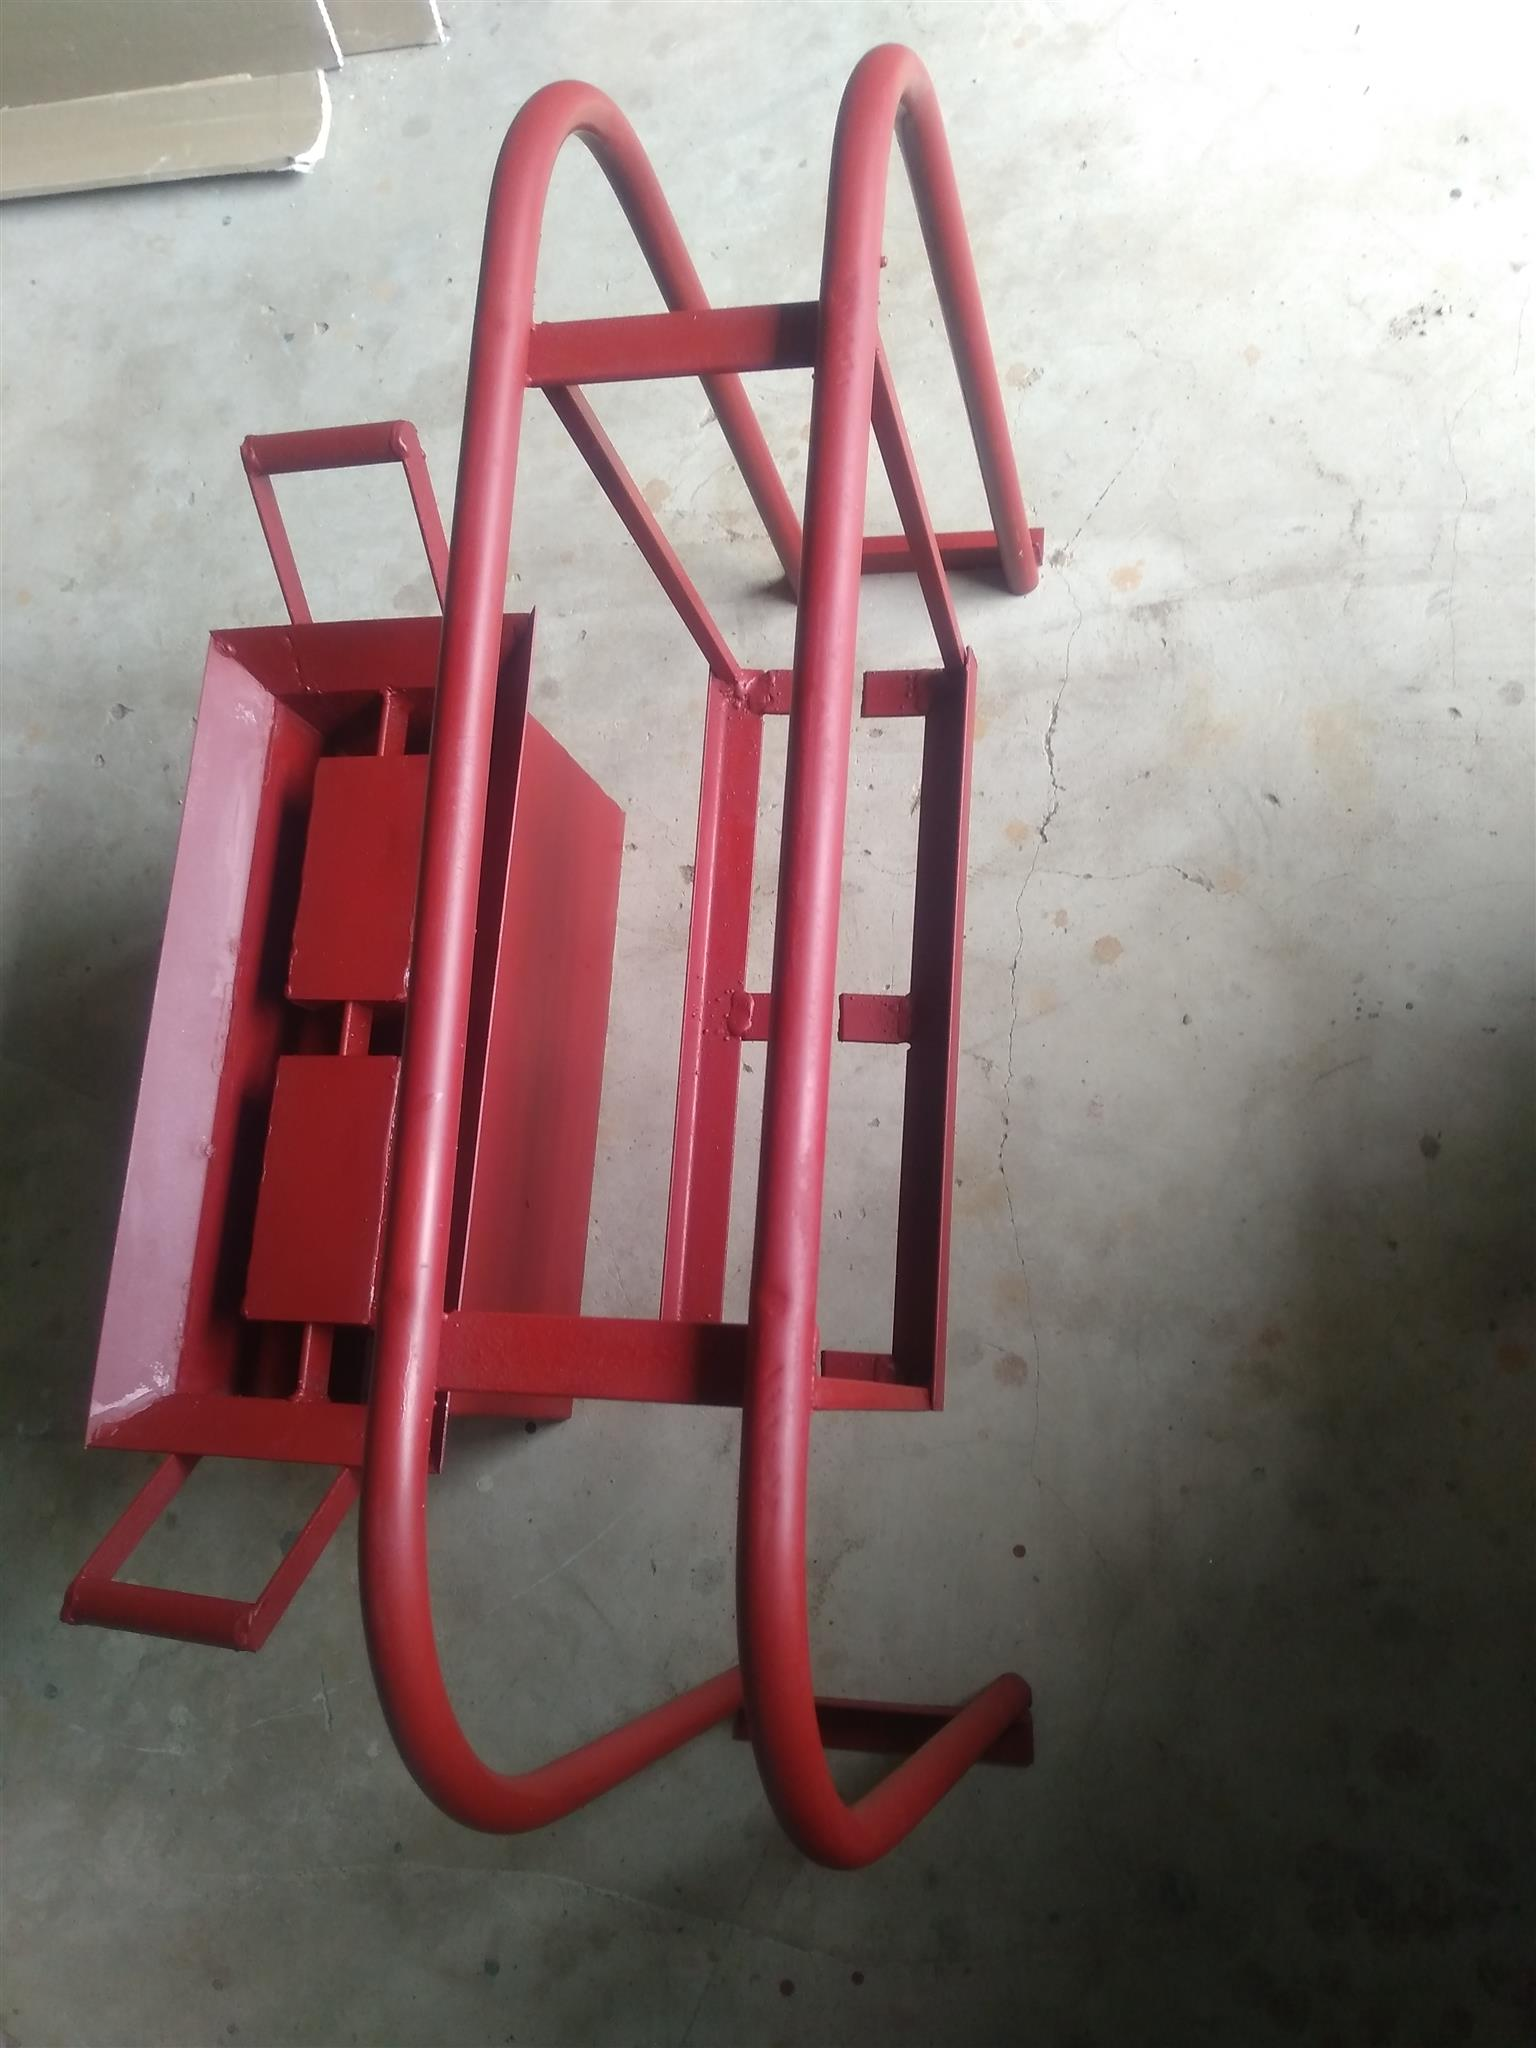 M150 BLOCK Making MACHINES